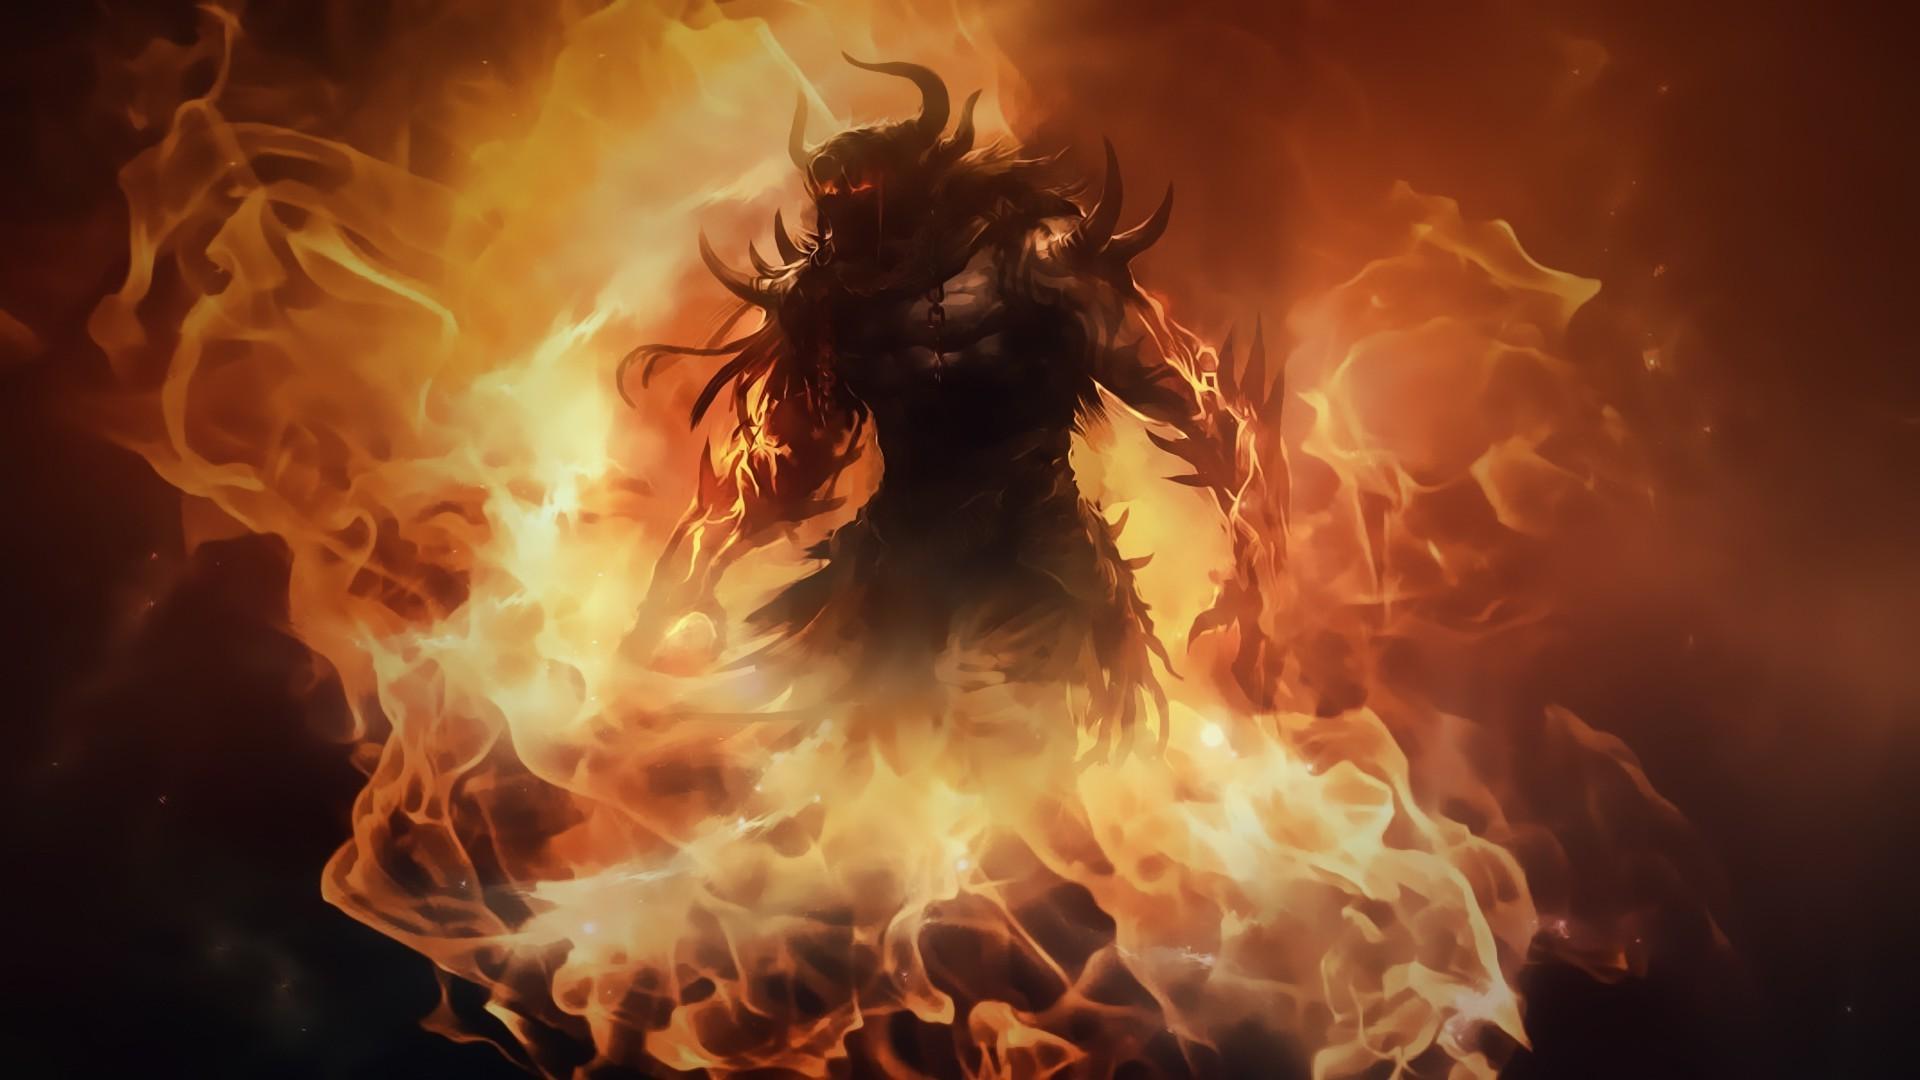 fire demon 1920x1080 wallpapers